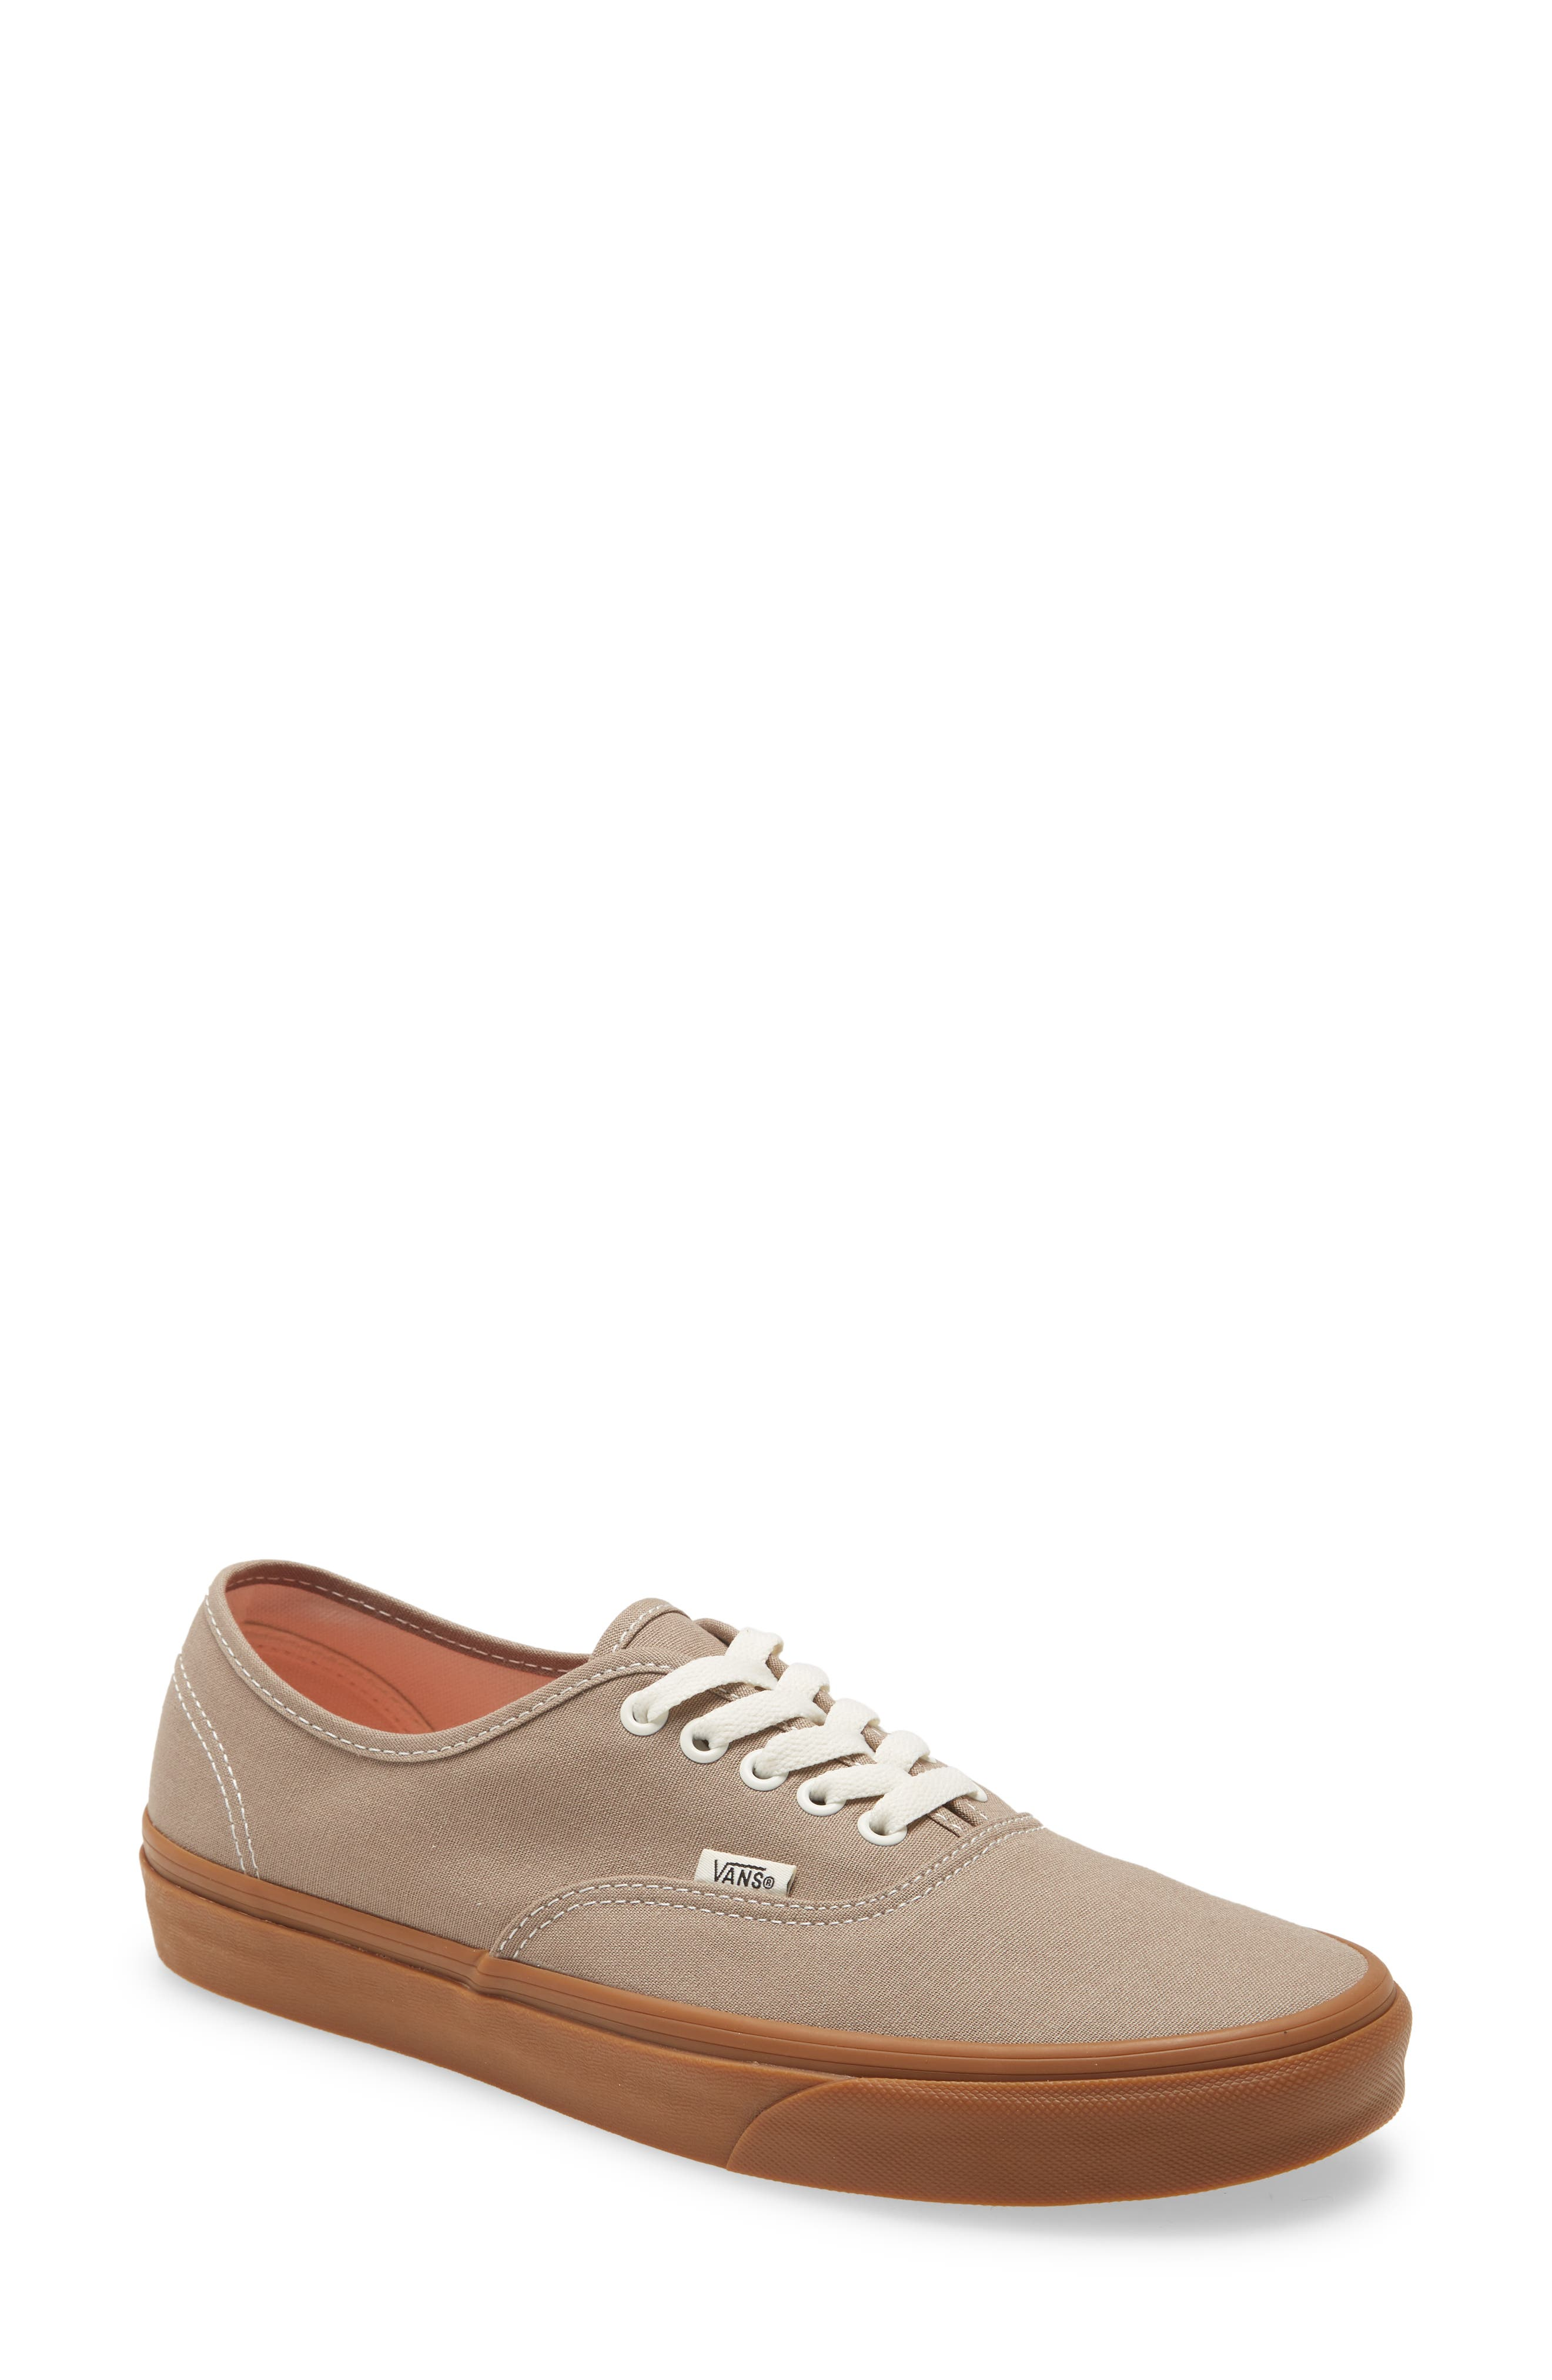 mens vans dress shoes